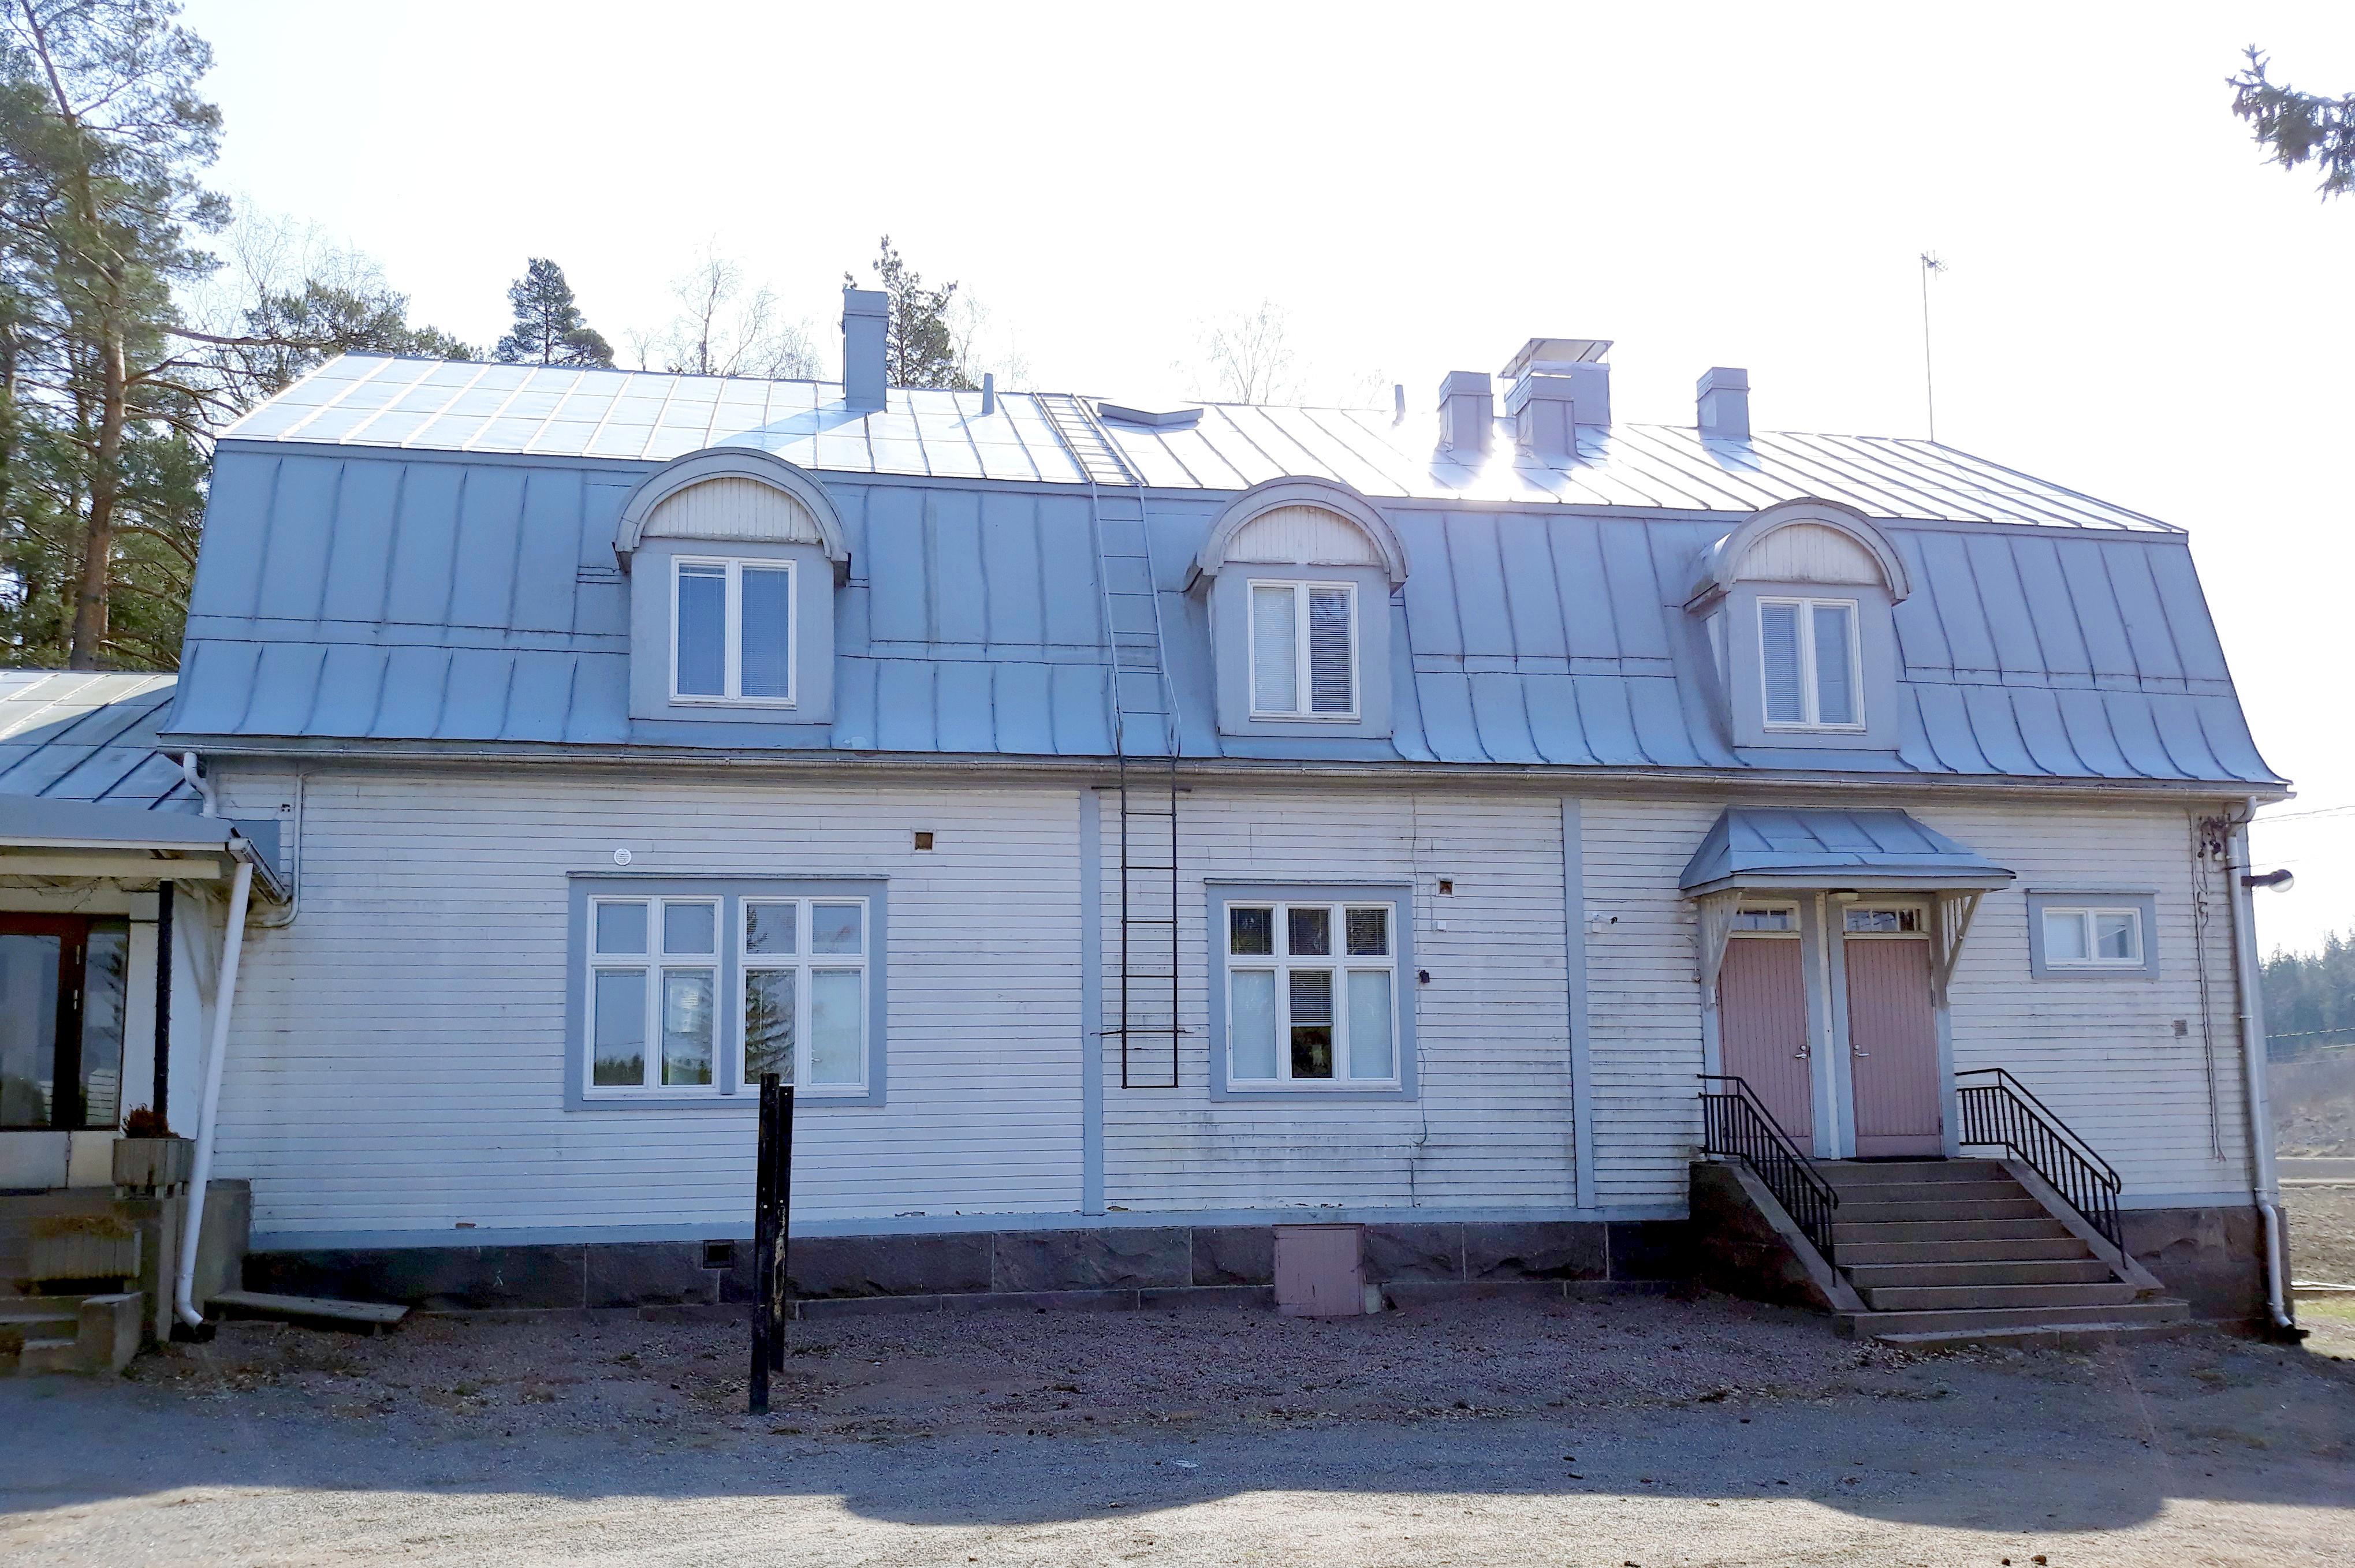 Toimitila, Saukonojantie 507, Saukonoja, Lieto